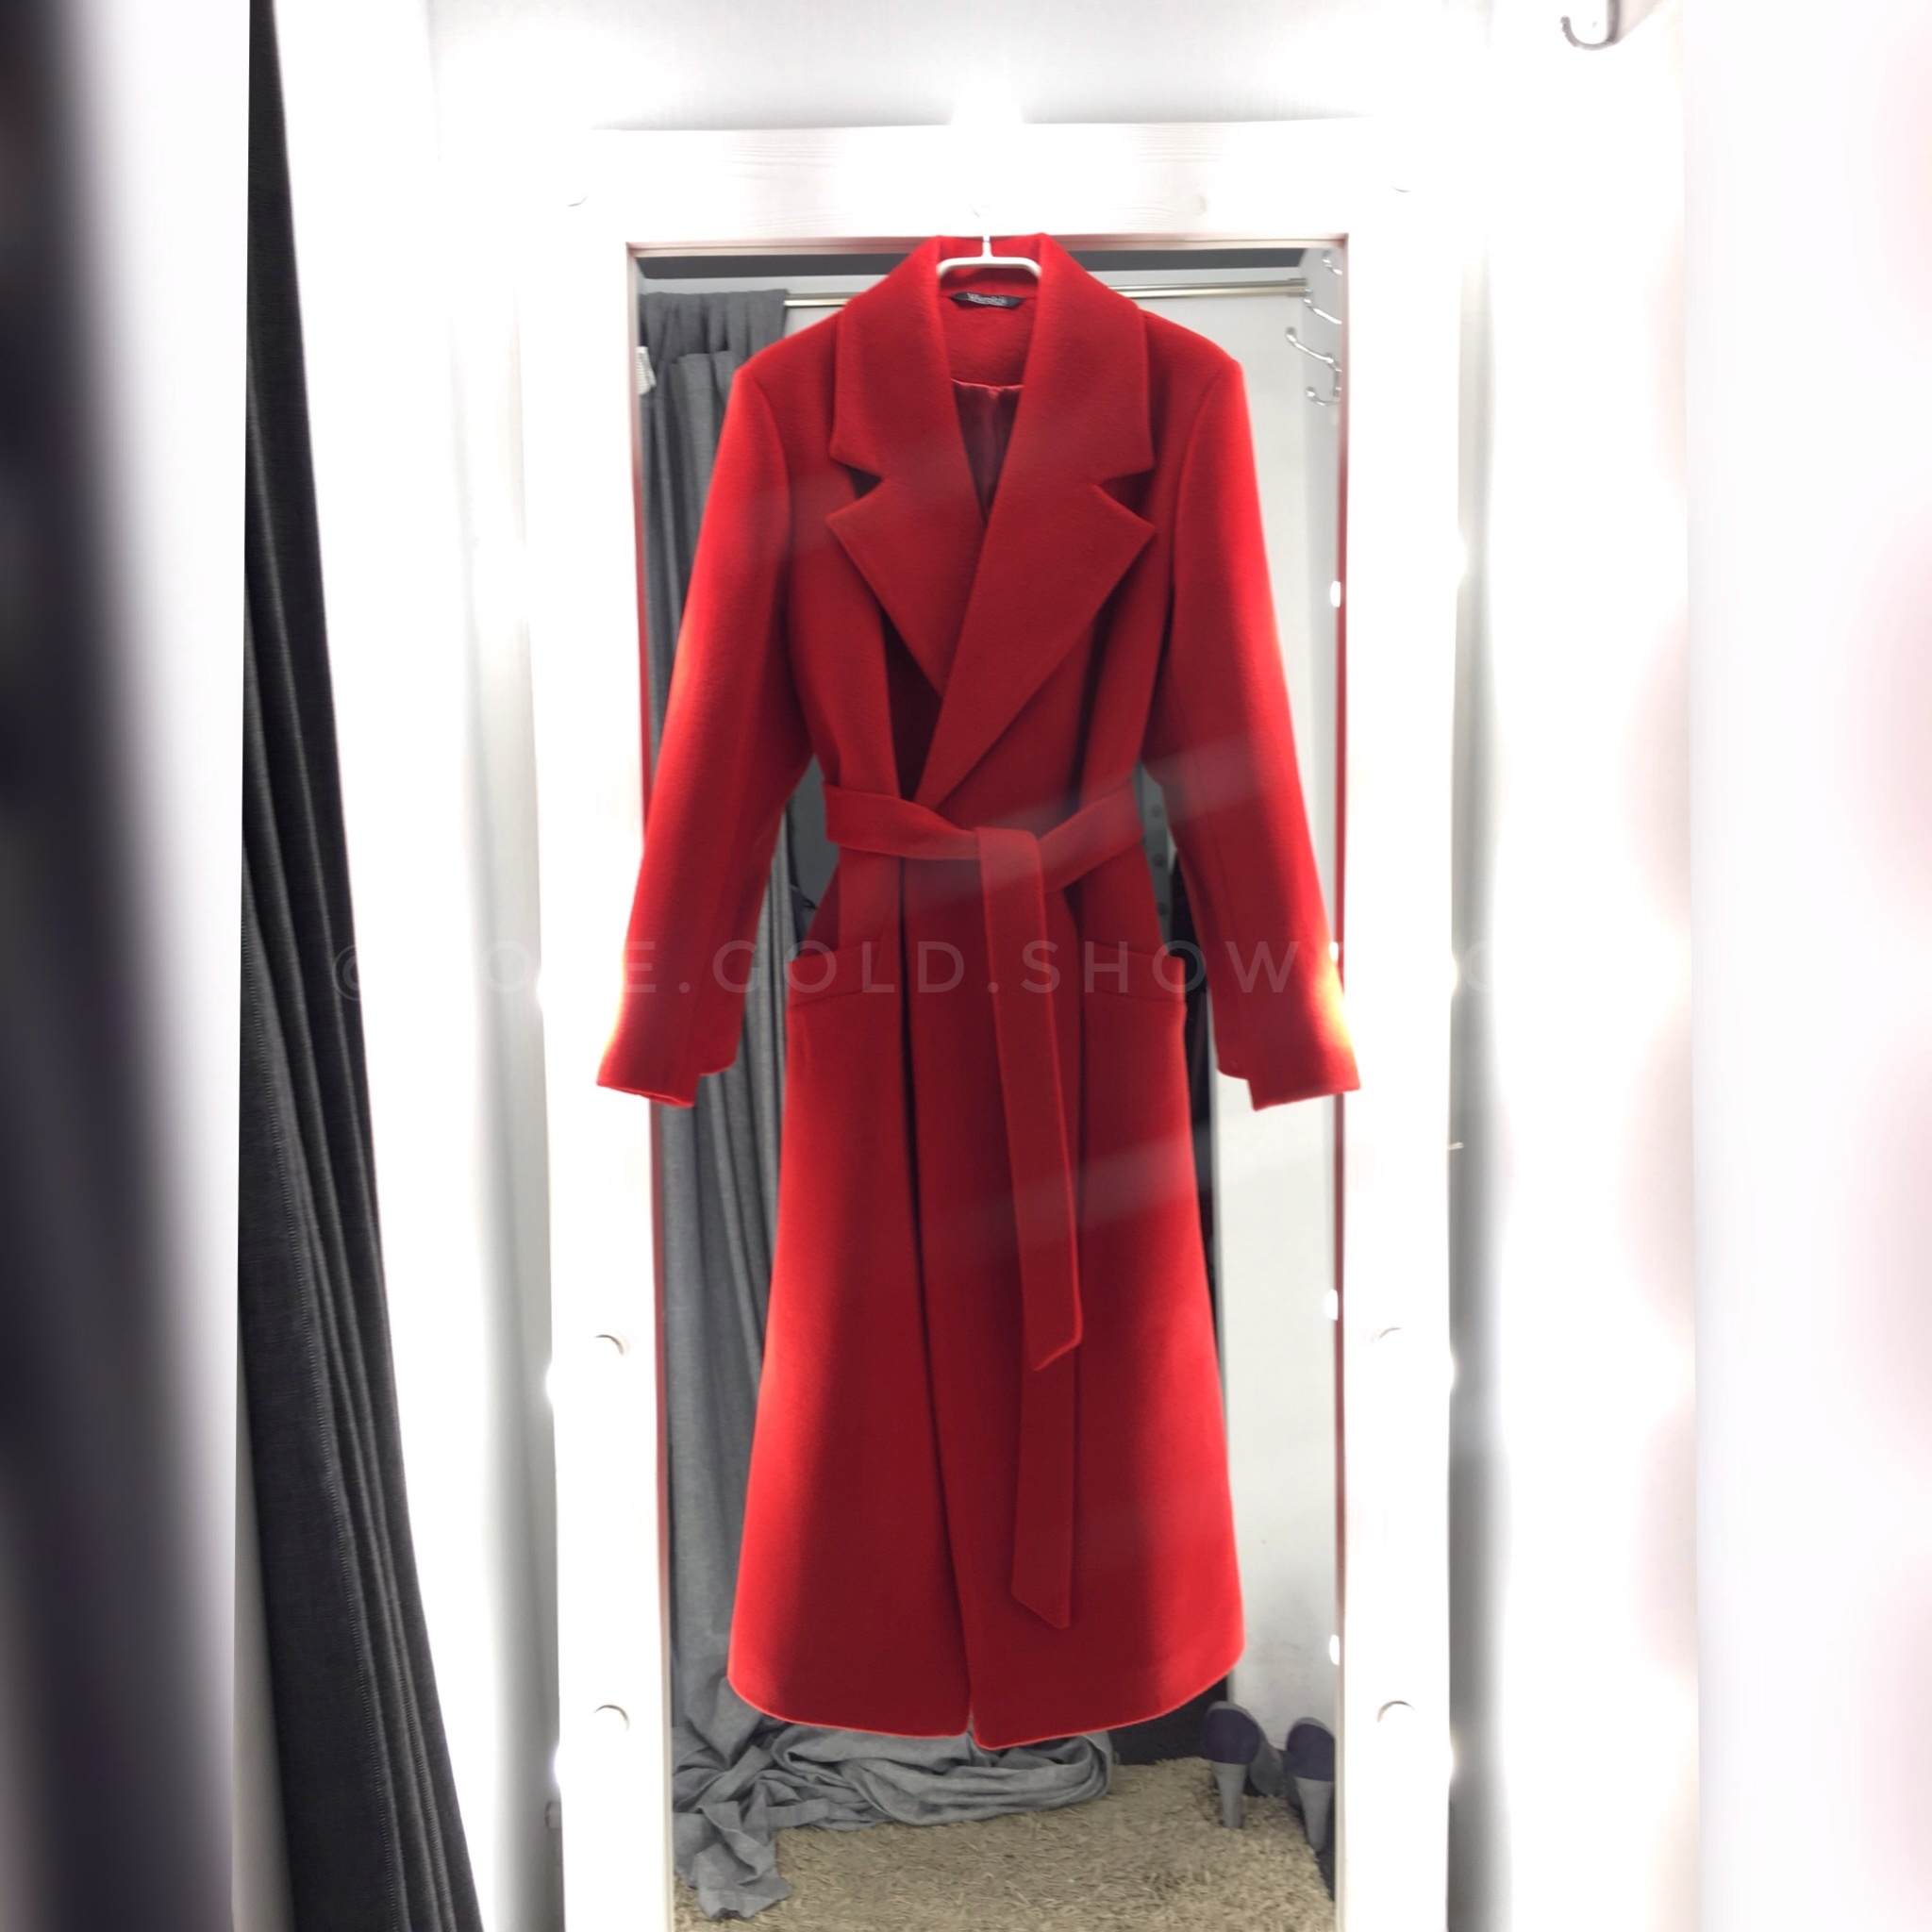 krasnoe-dlinnoe-palto